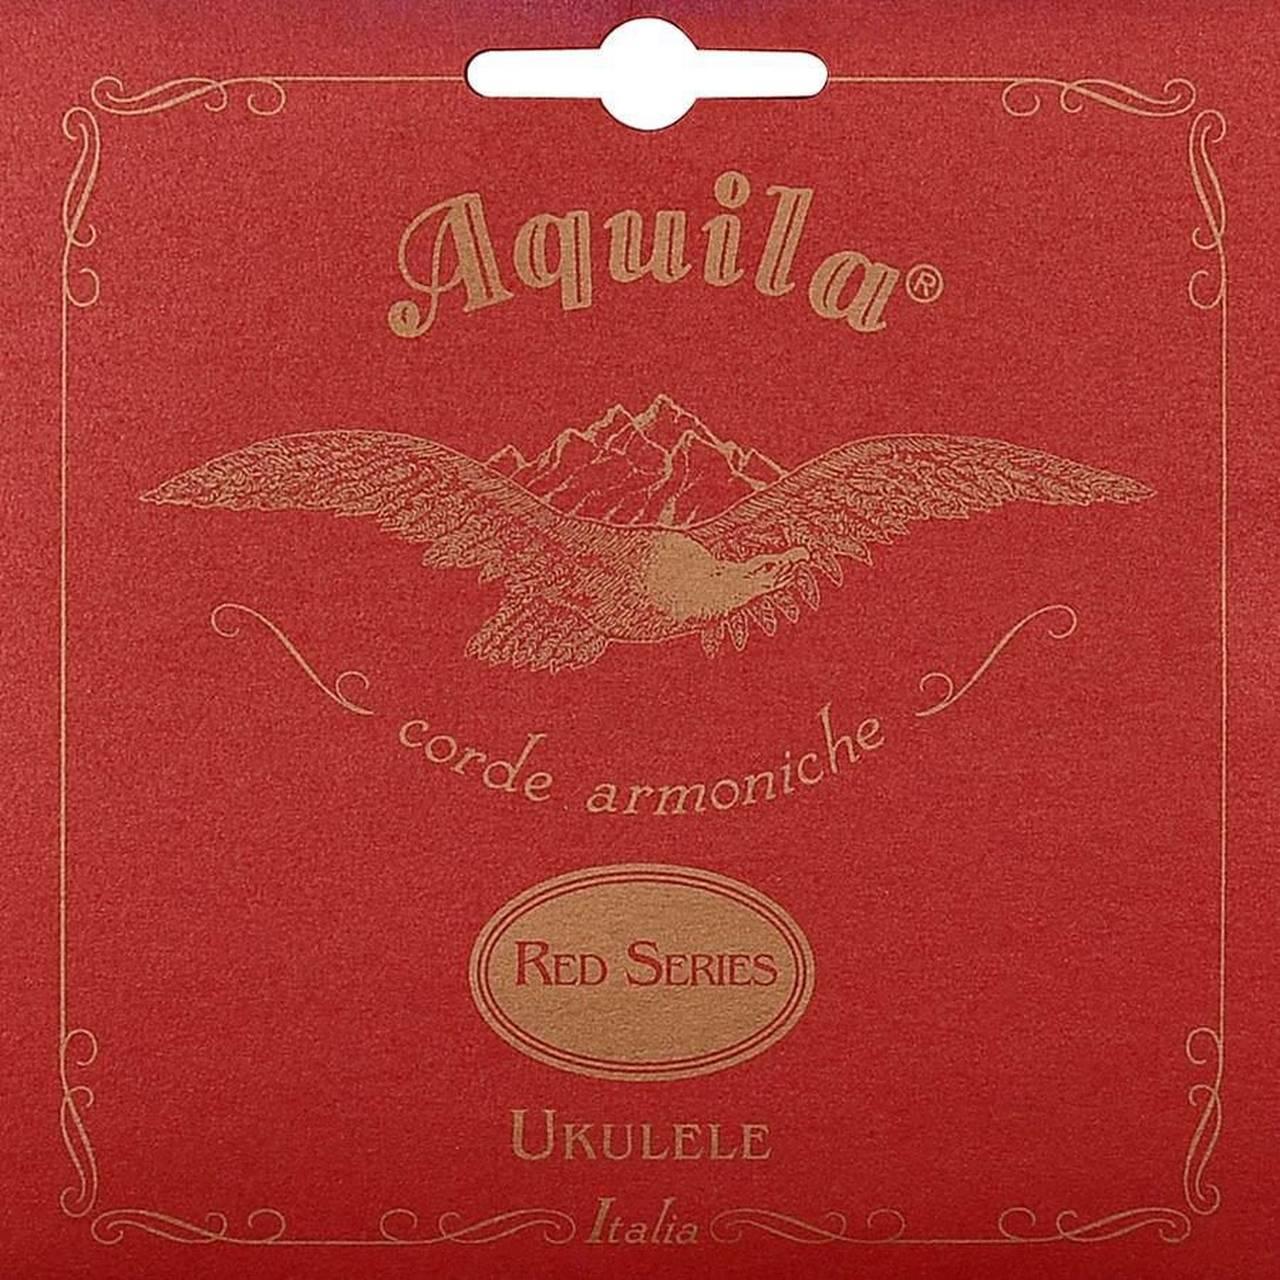 Encordoamento Aquila AQ 85U Red Series High G Ukulele Concert